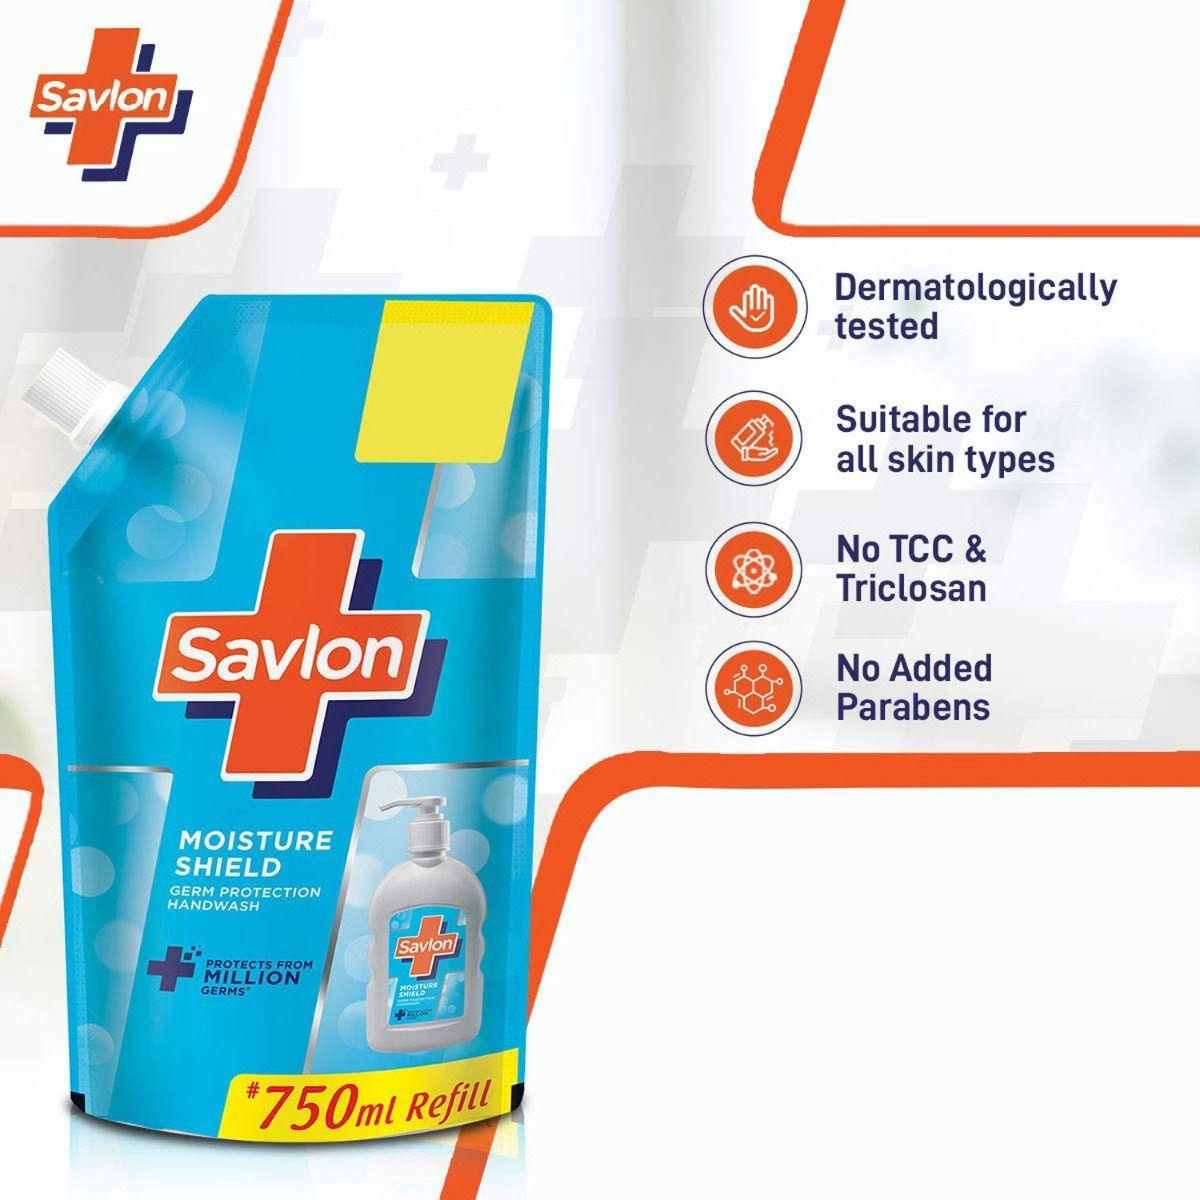 Savlon Moisture Shield Germ Protection Handwash, 750 ml Refill Pack, Pack of 1